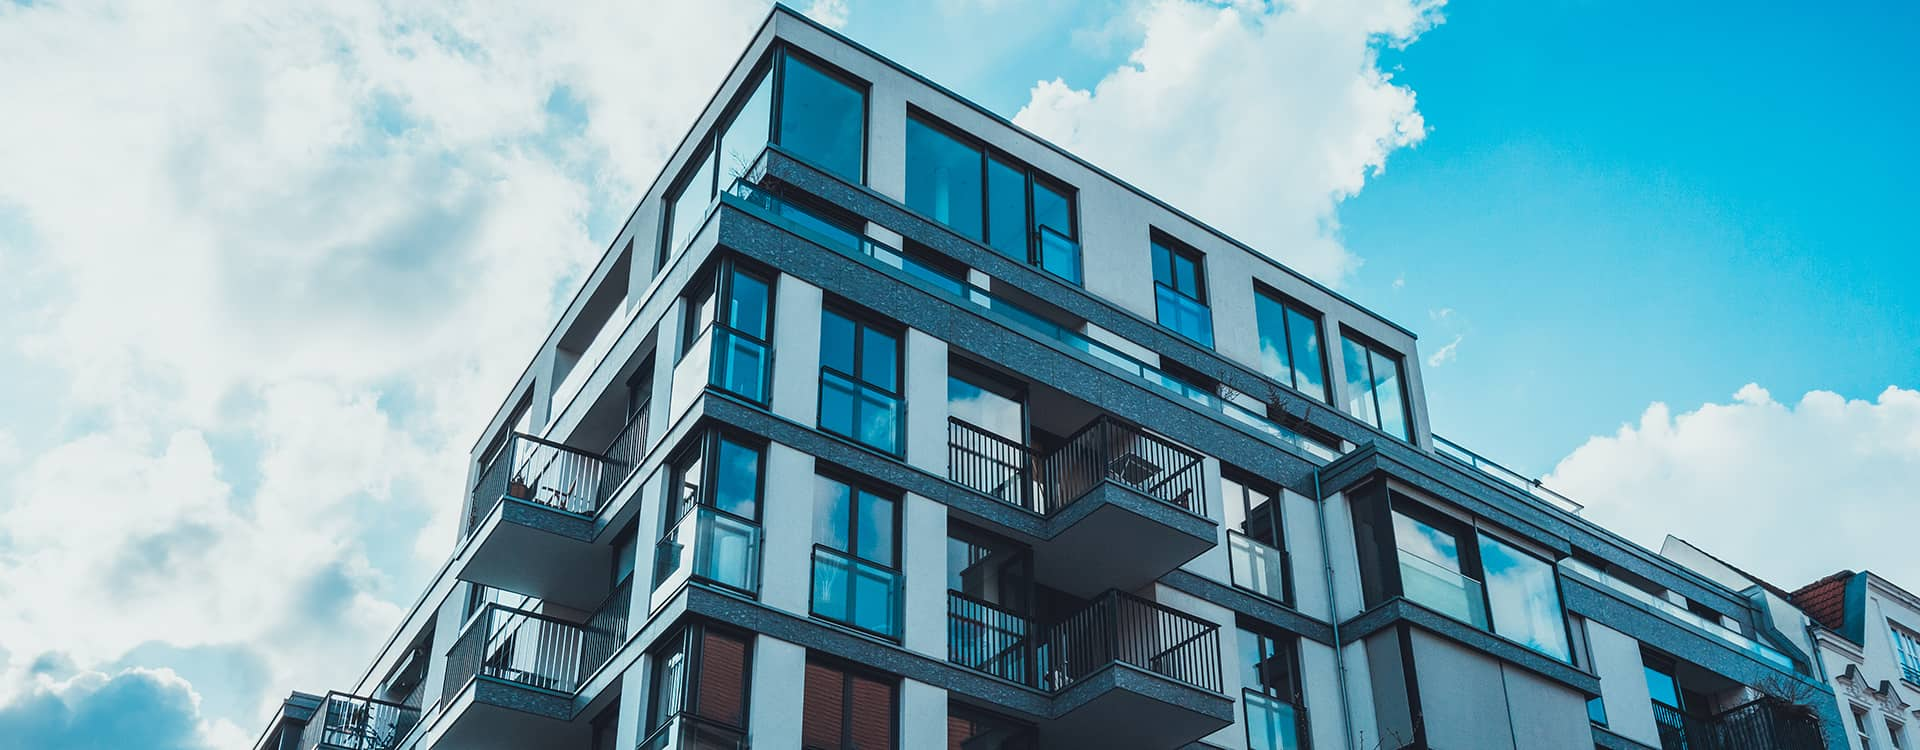 What is condominium management – is it property management? Image